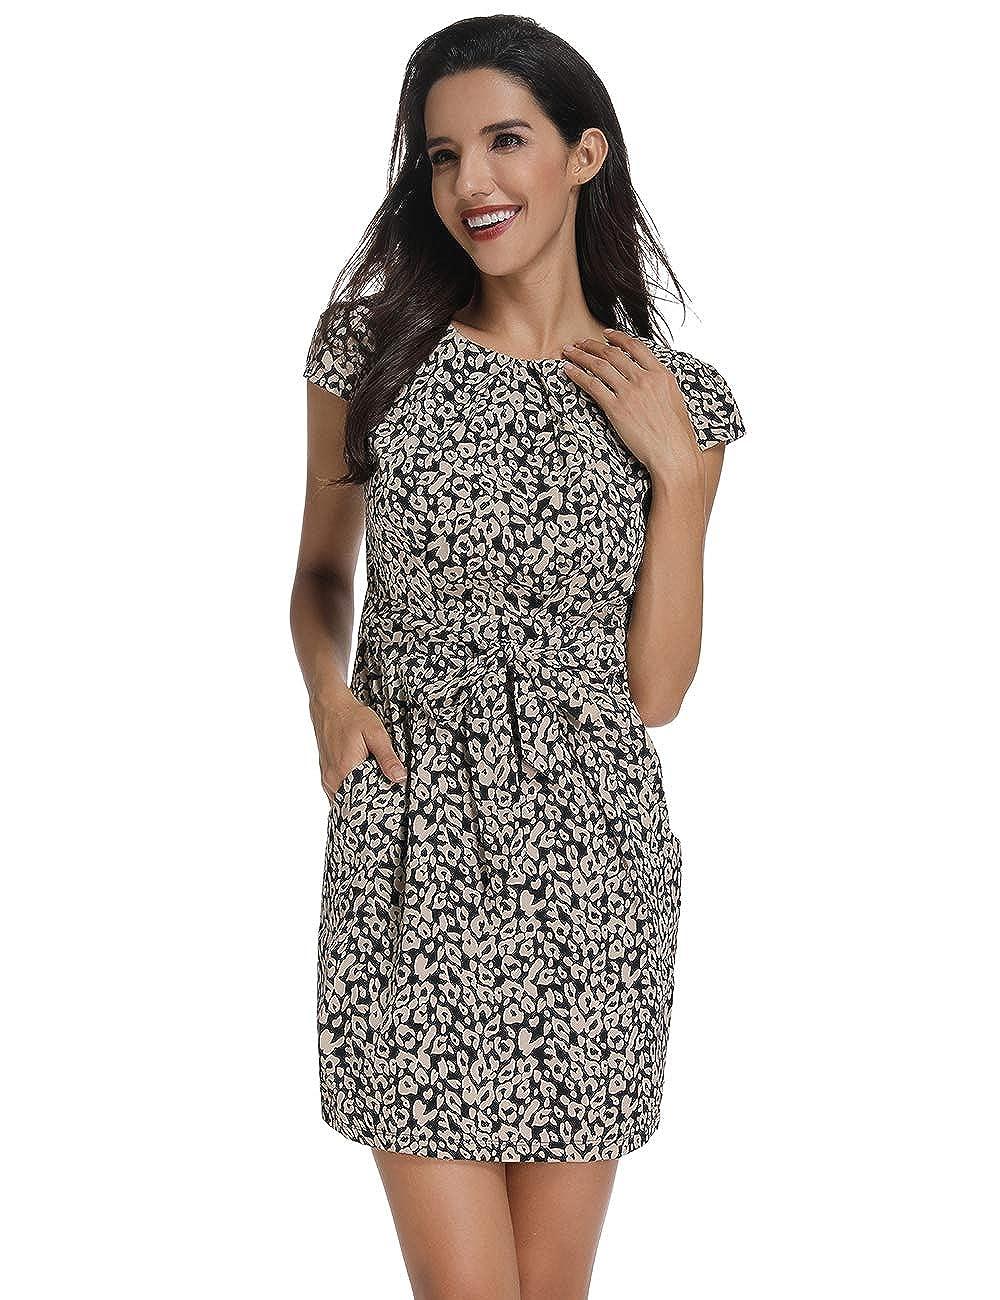 Loneni Womens Cap Sleeve Split Print Cocktail Party Flower Dress With Belt